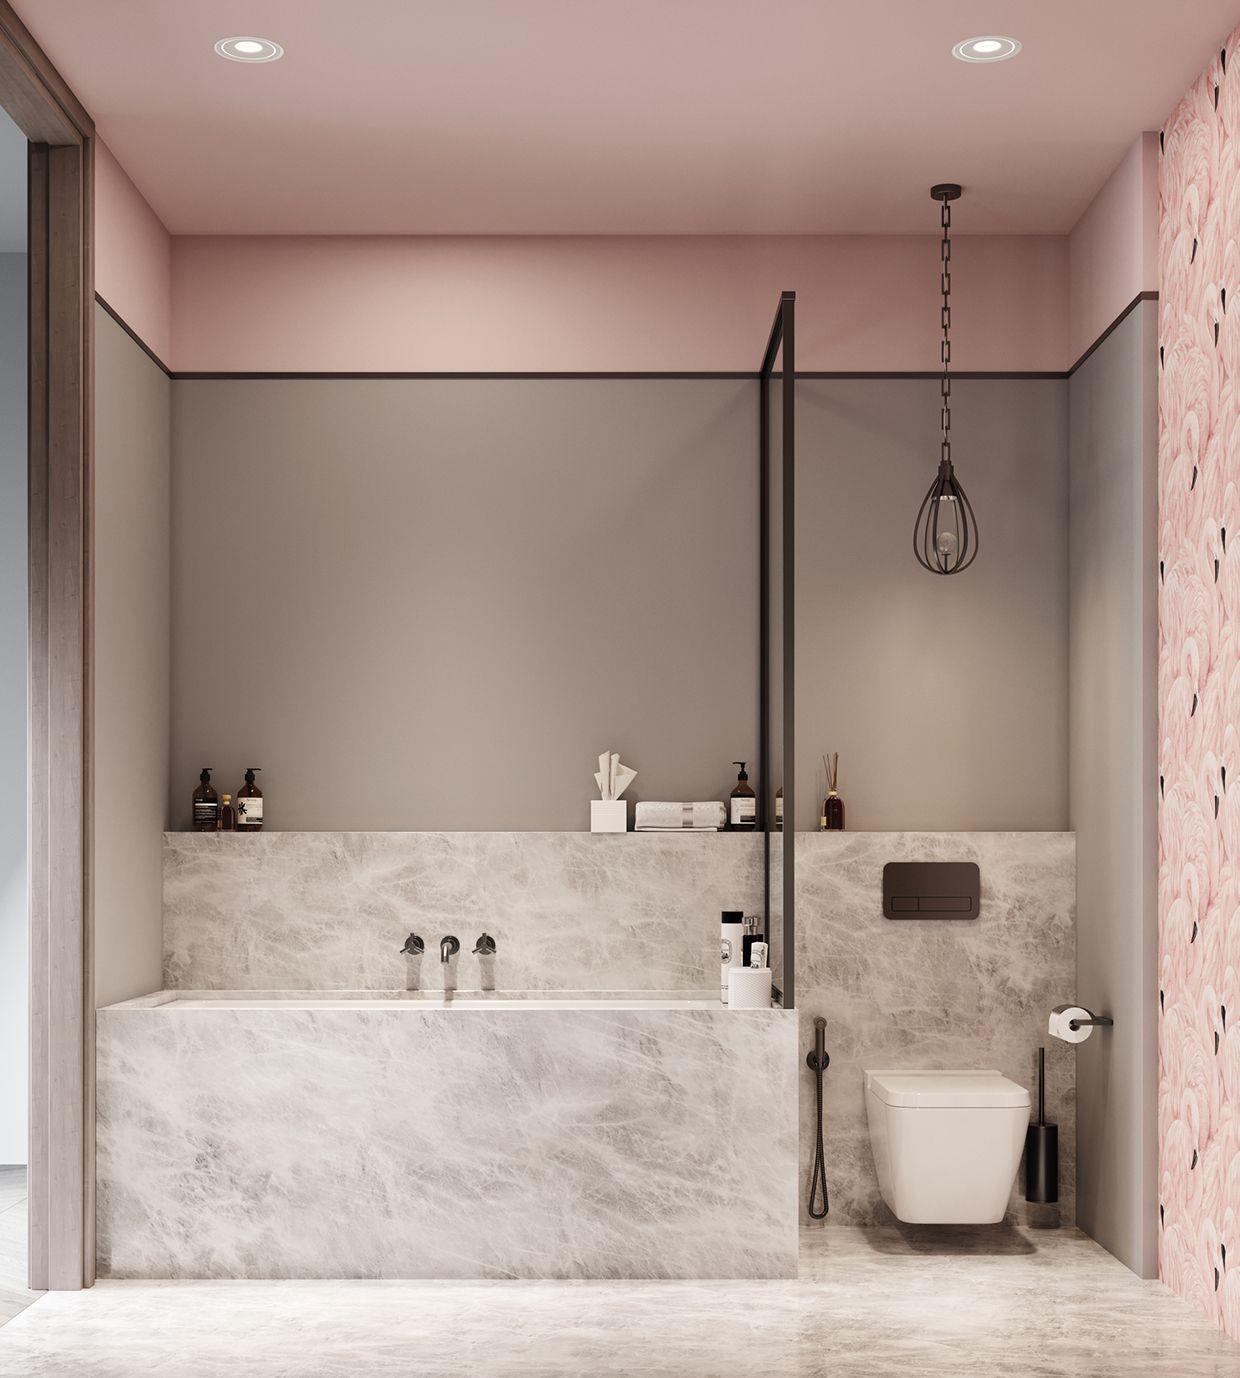 Badkamer in roze én marmer. | Badkamers | Pinterest | Bäder ...